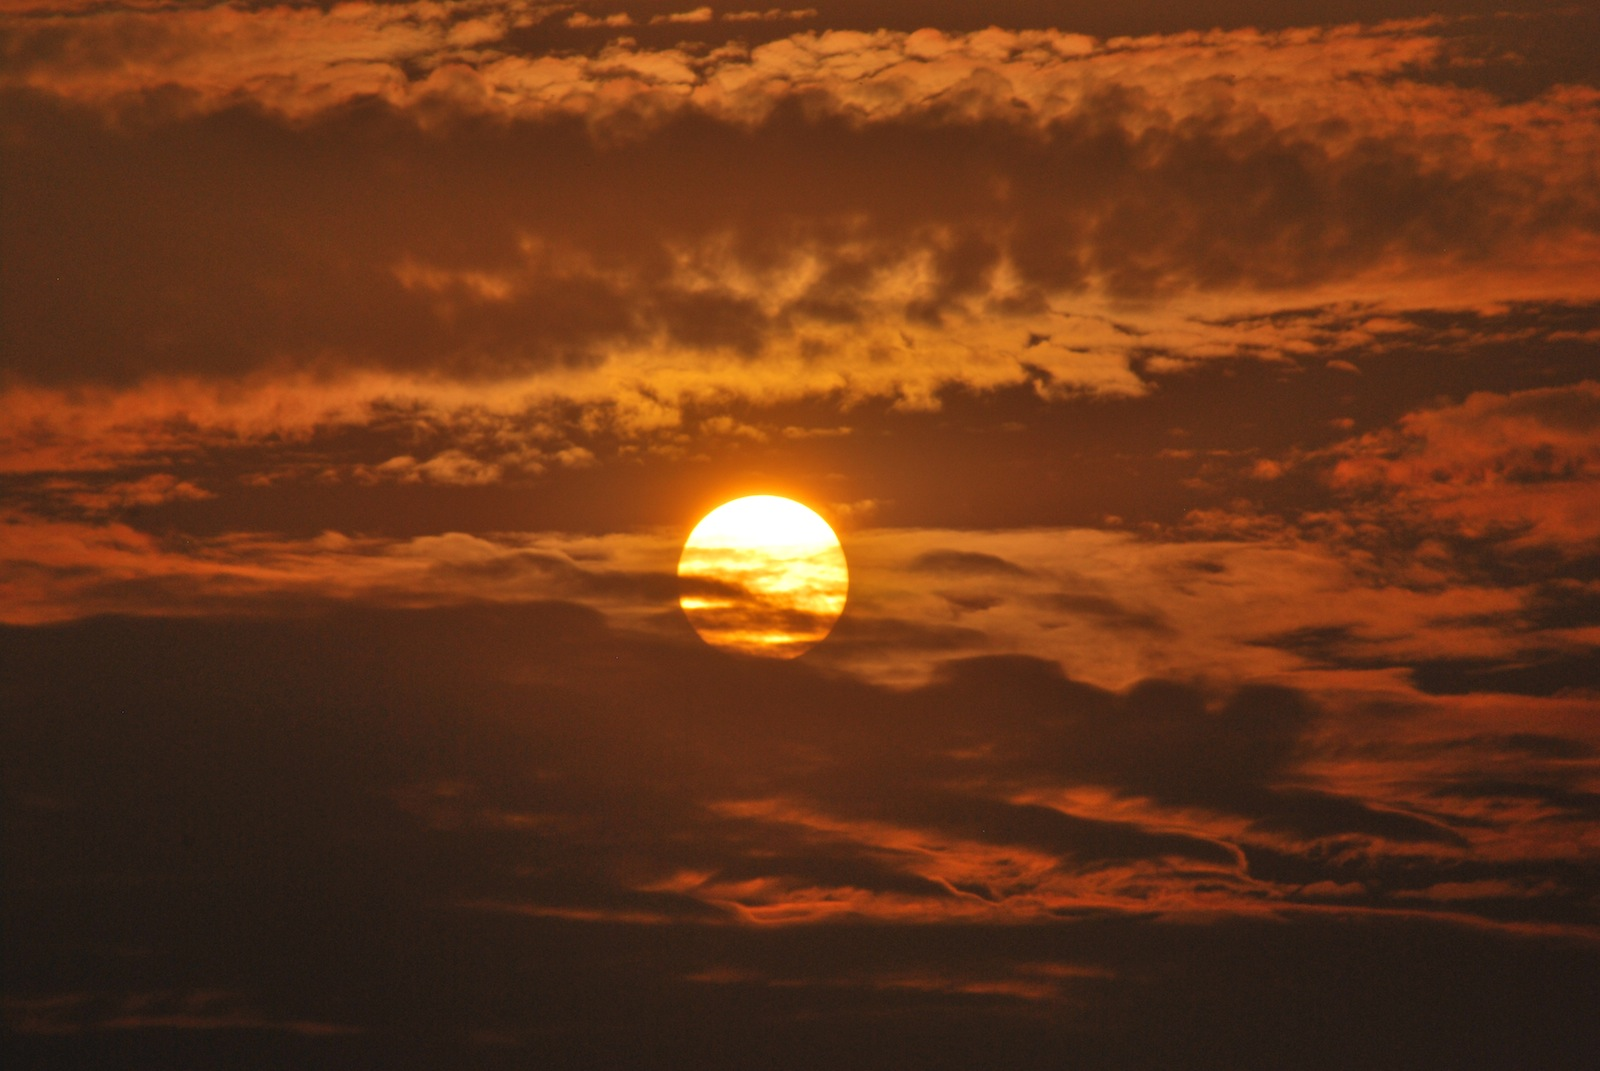 Sun at 5 pm - from Hemakuta Hills